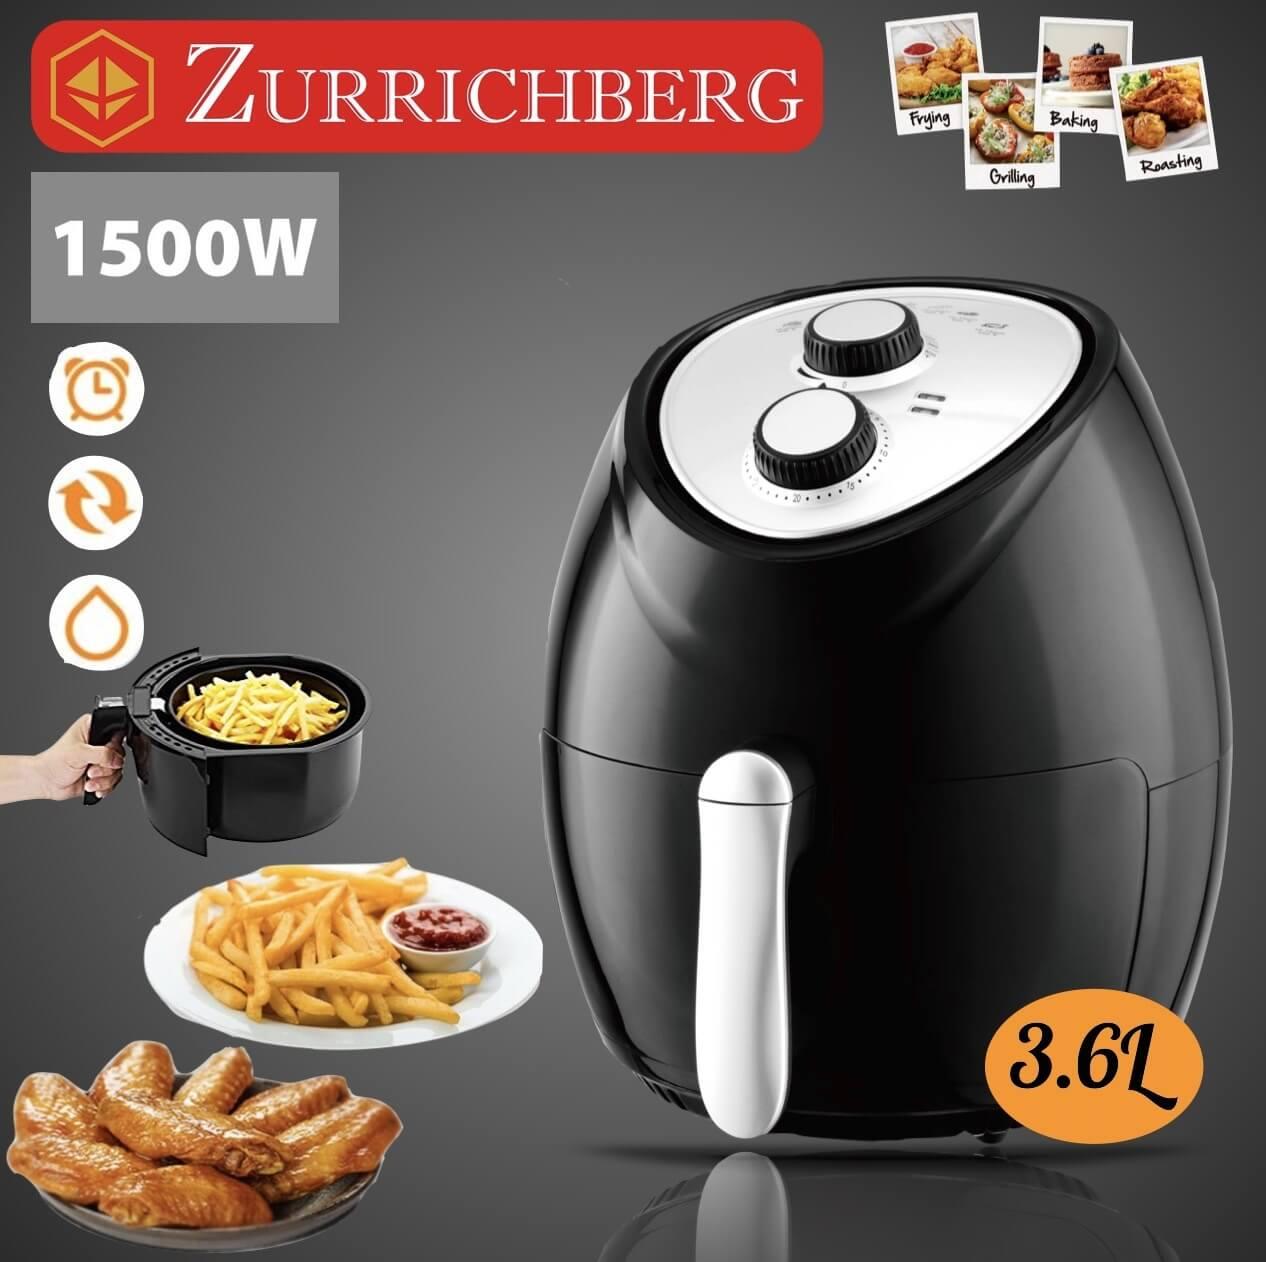 Zurrichberg Profesionalna friteza za pečenje bez ulja 3.6L 1500W